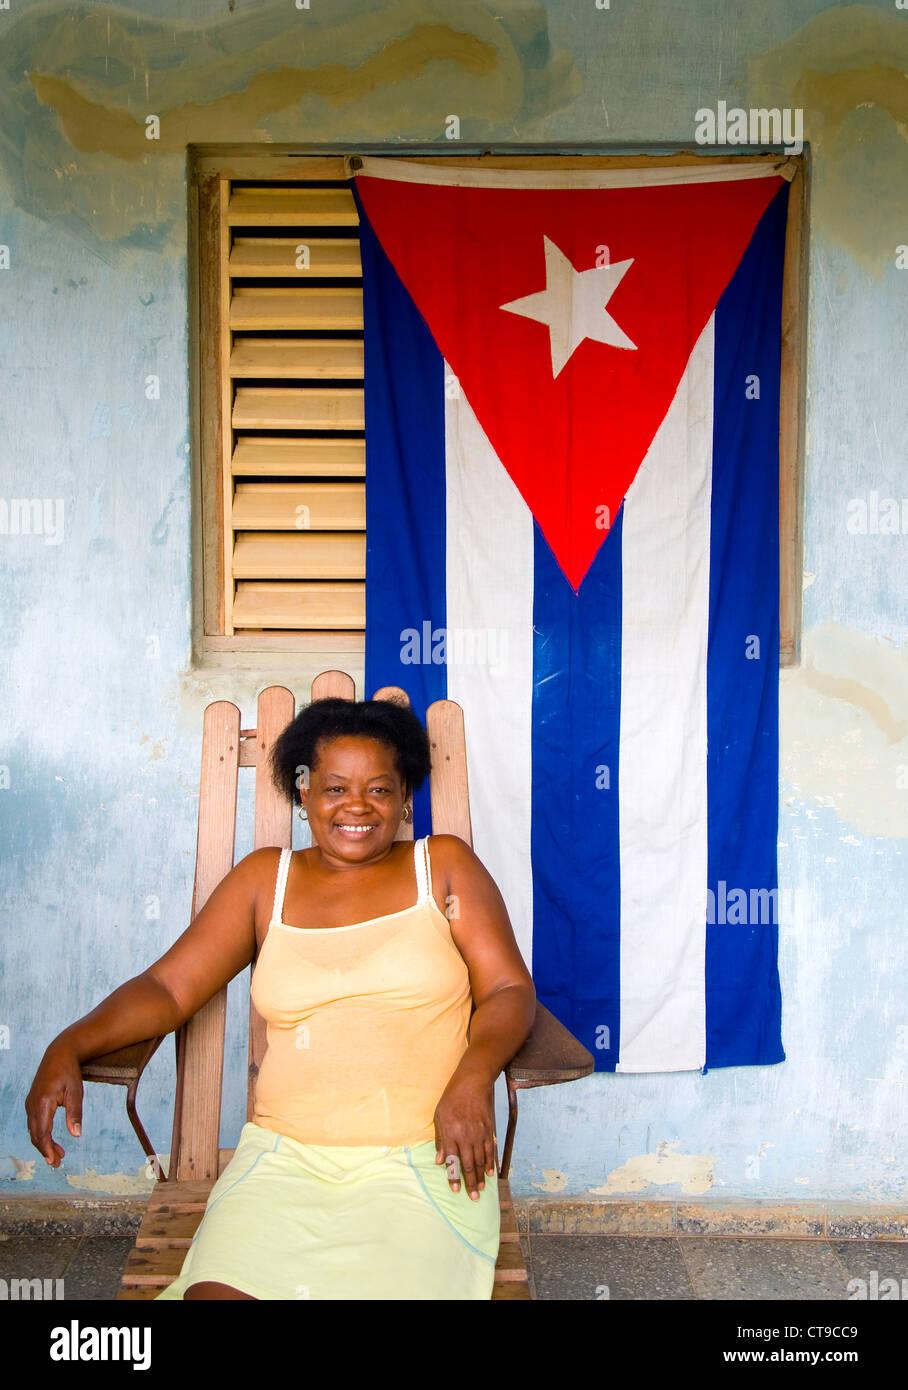 Frau auf der Veranda mit kubanischen Flagge, Viñales, Kuba Stockbild